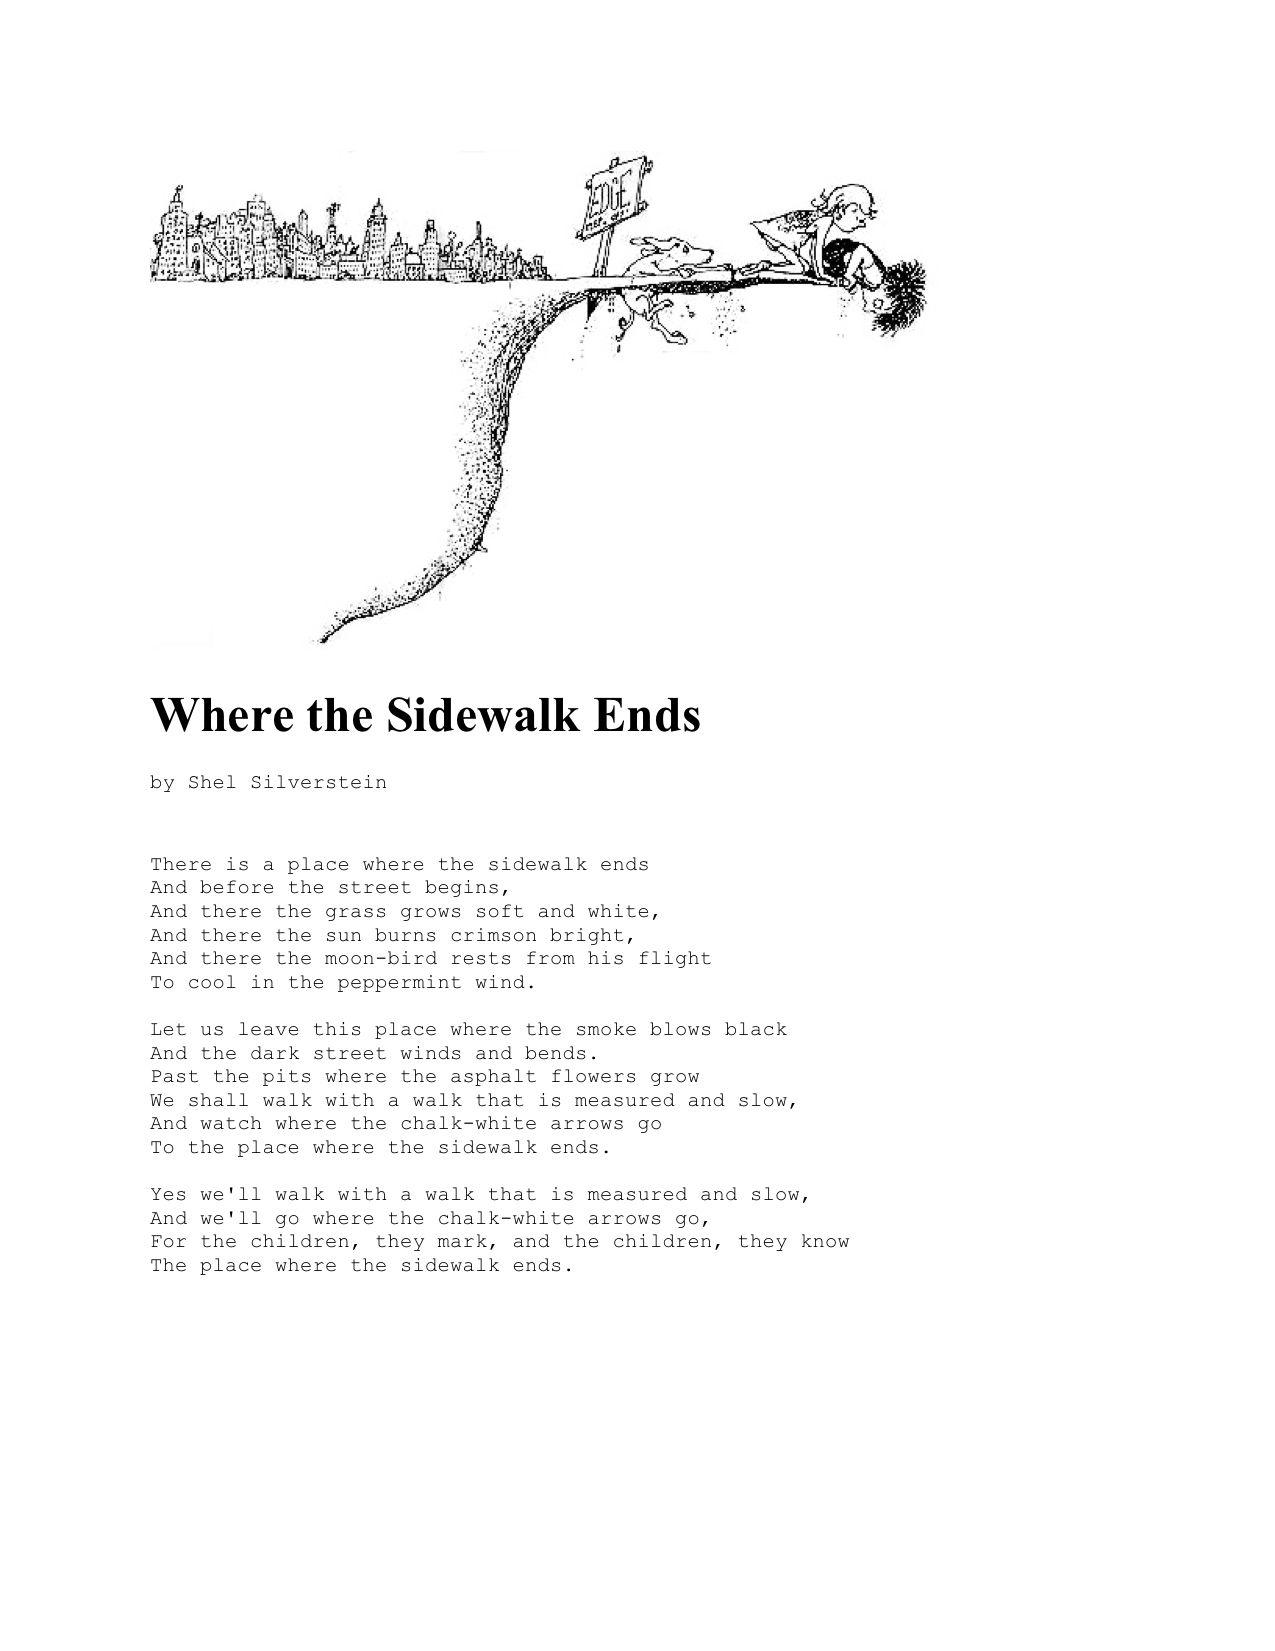 Google Image Result For Https Www Poemsearcher Com Images Poemsearcher E3 E36e64b7c262ce9c8c57d7495c6d6c5 In 2020 Where The Sidewalk Ends Shel Silverstein Peppermint